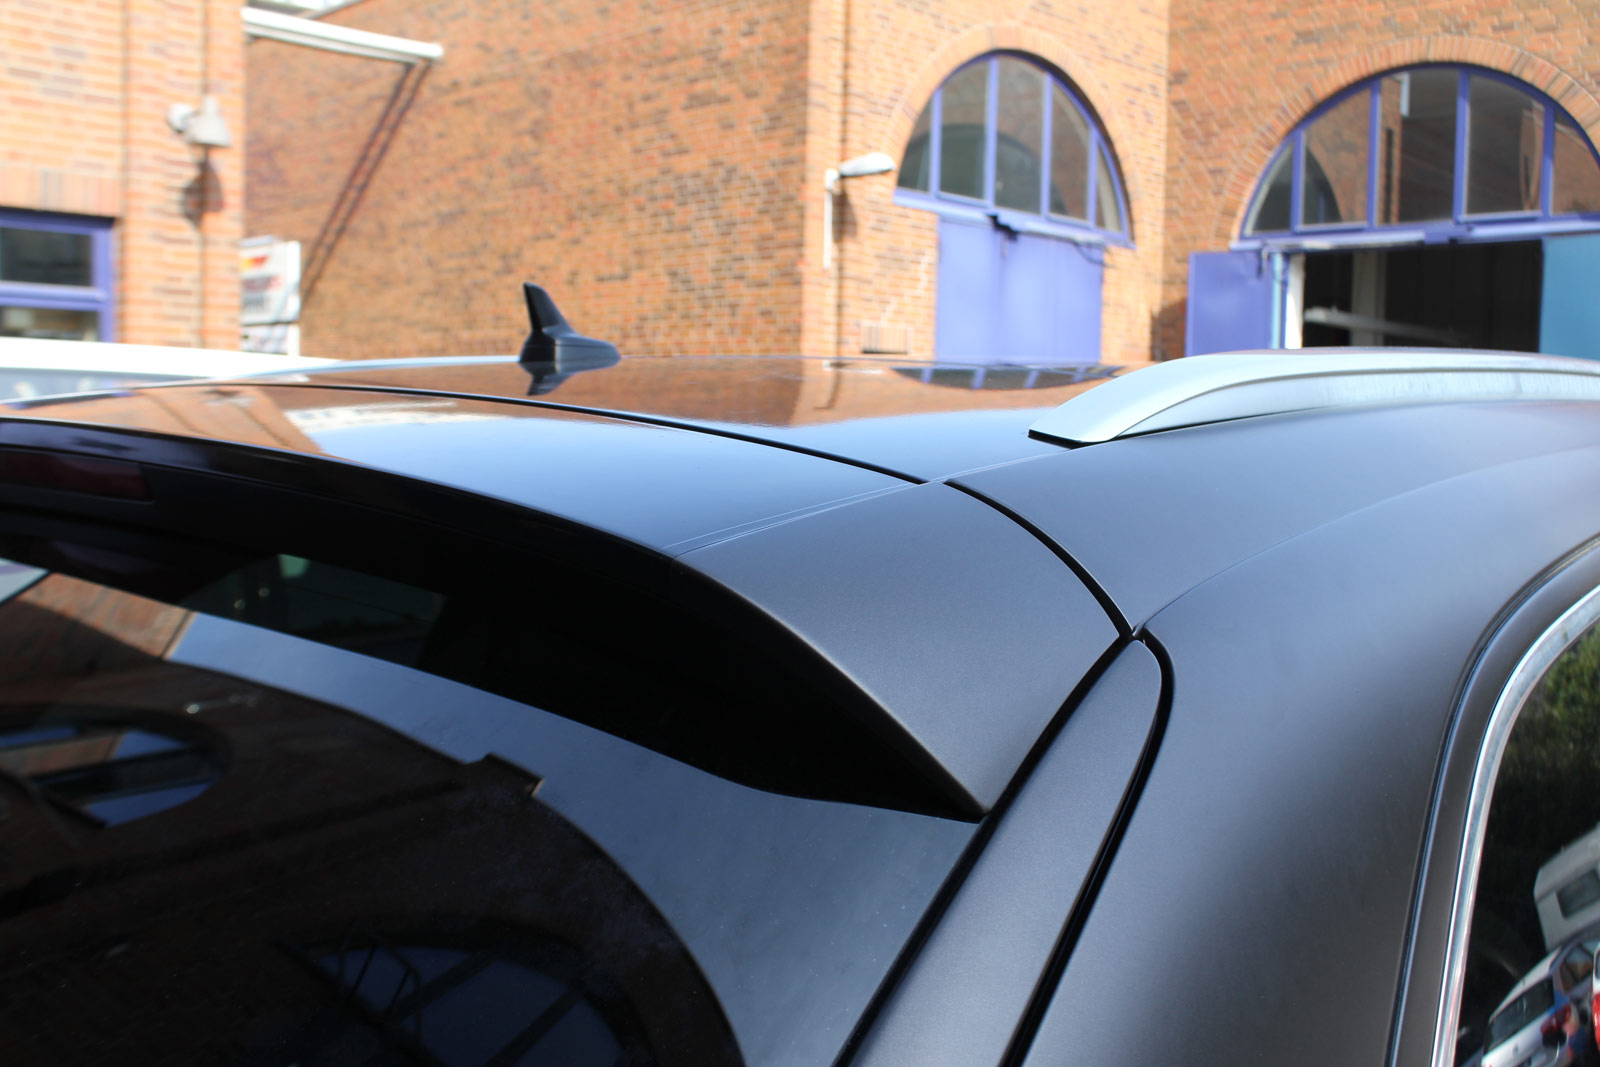 Audi_Q7_Folierung_Braun_Matt_Metallic_08